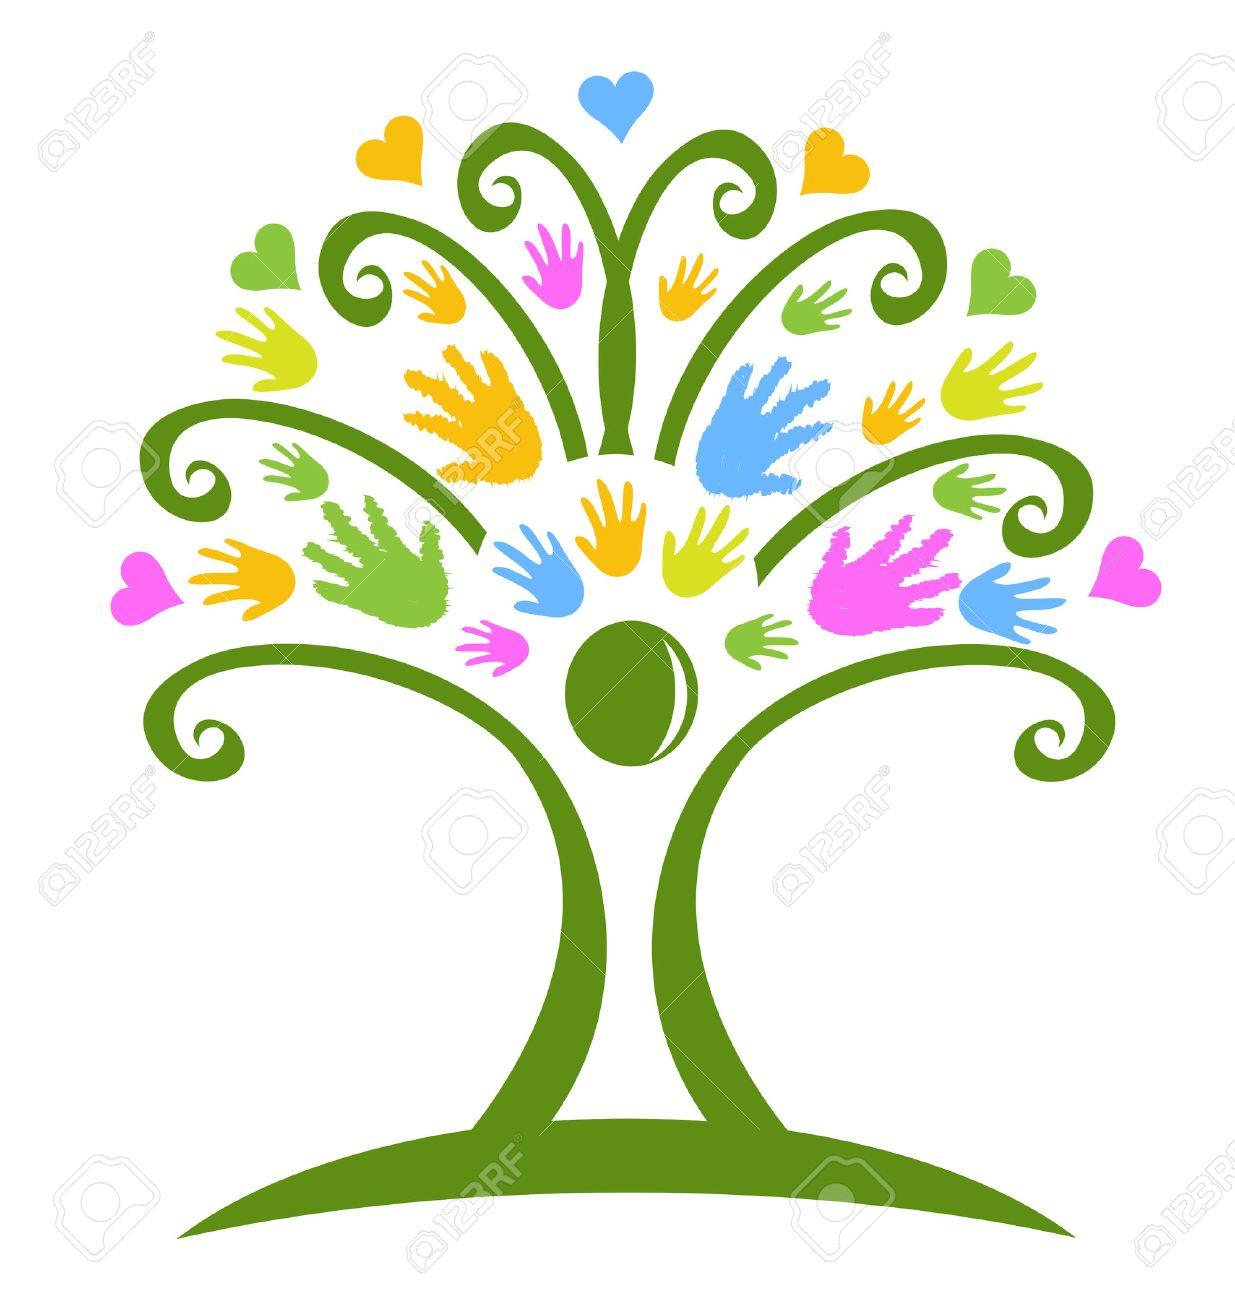 Tree hands childcare symbol logo vector - 43952294